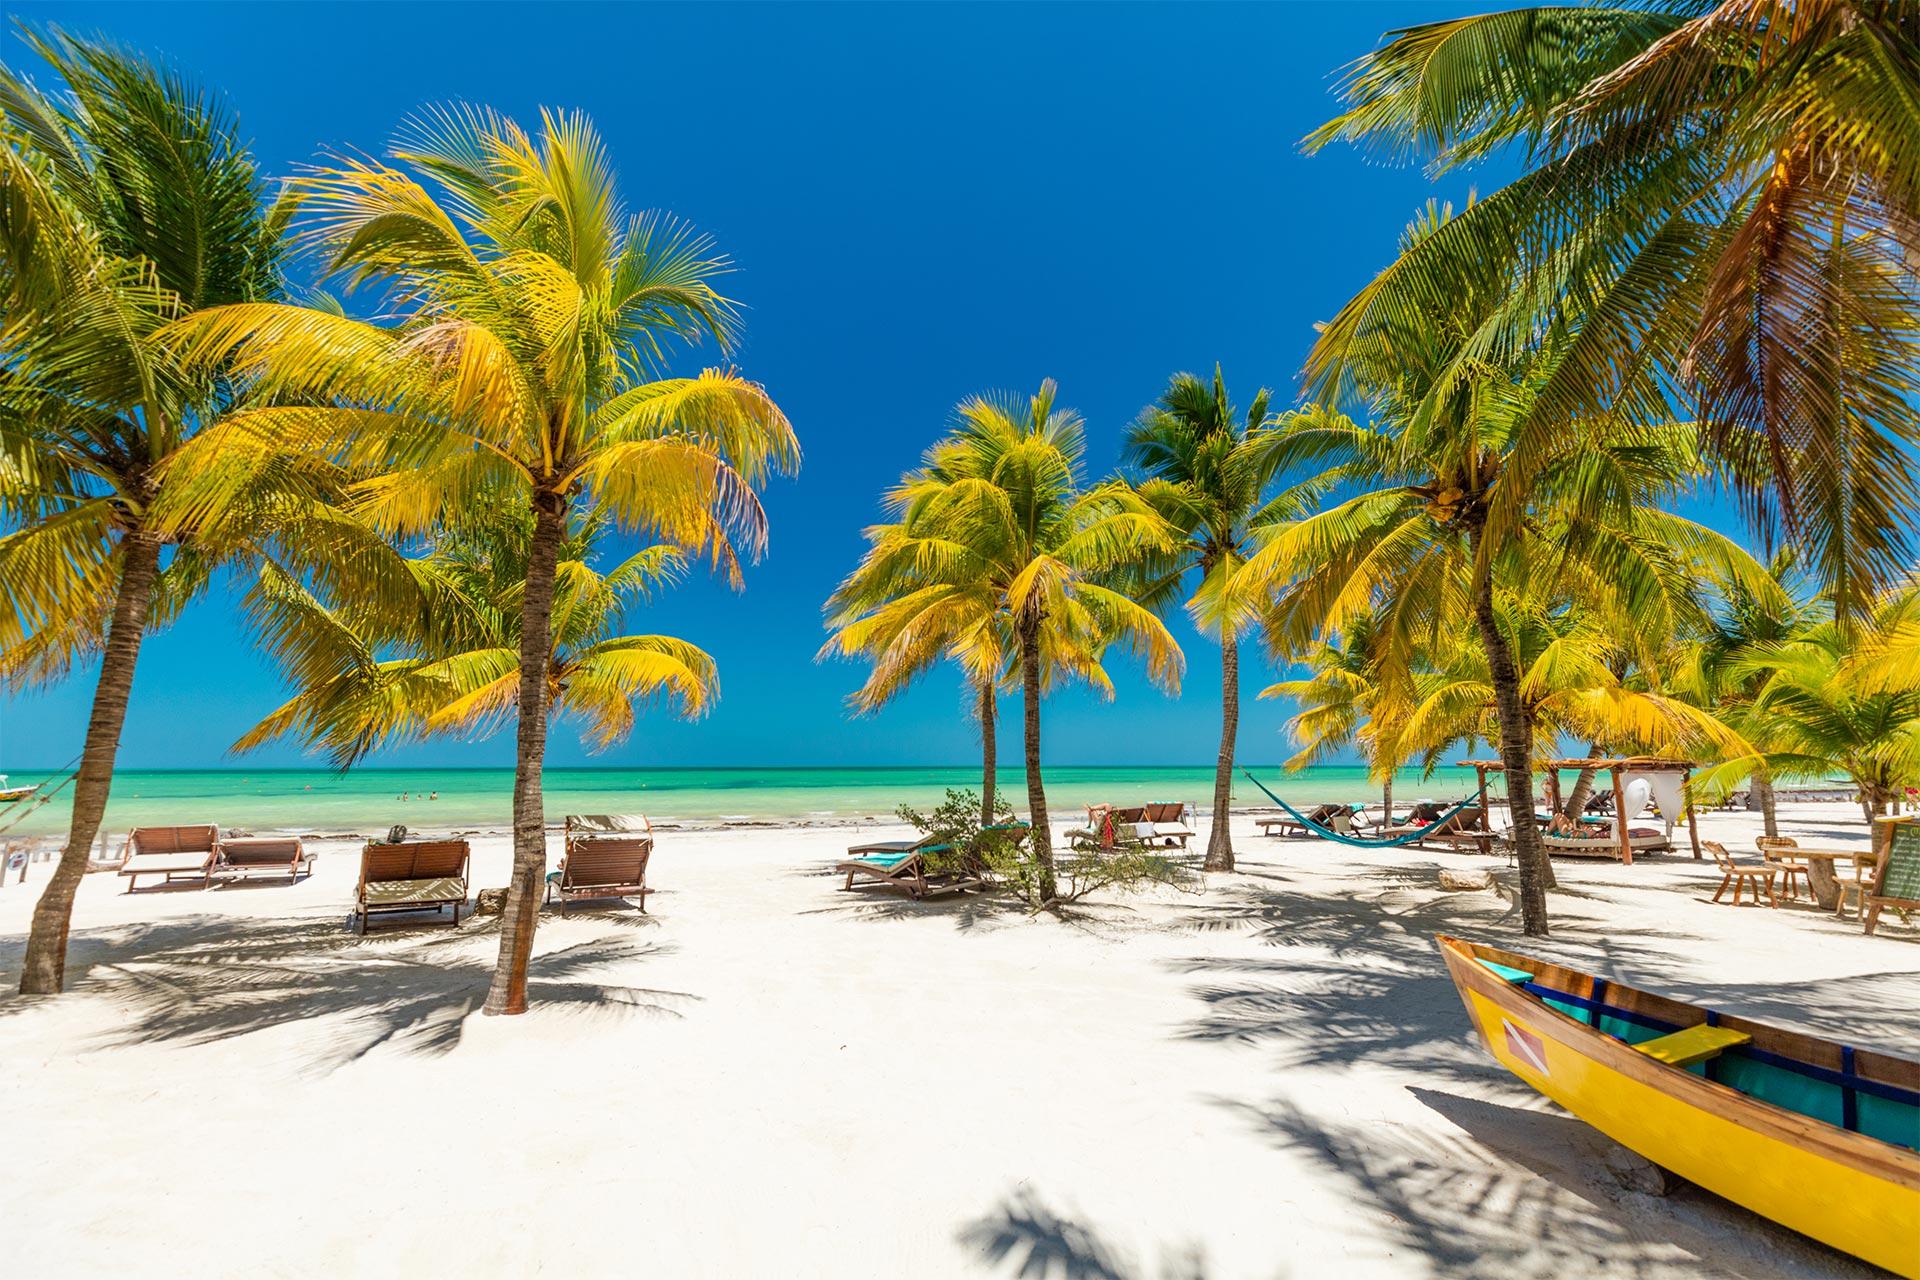 Sejur plaja Riviera Maya, Mexic, 9 zile - Iulie 2021